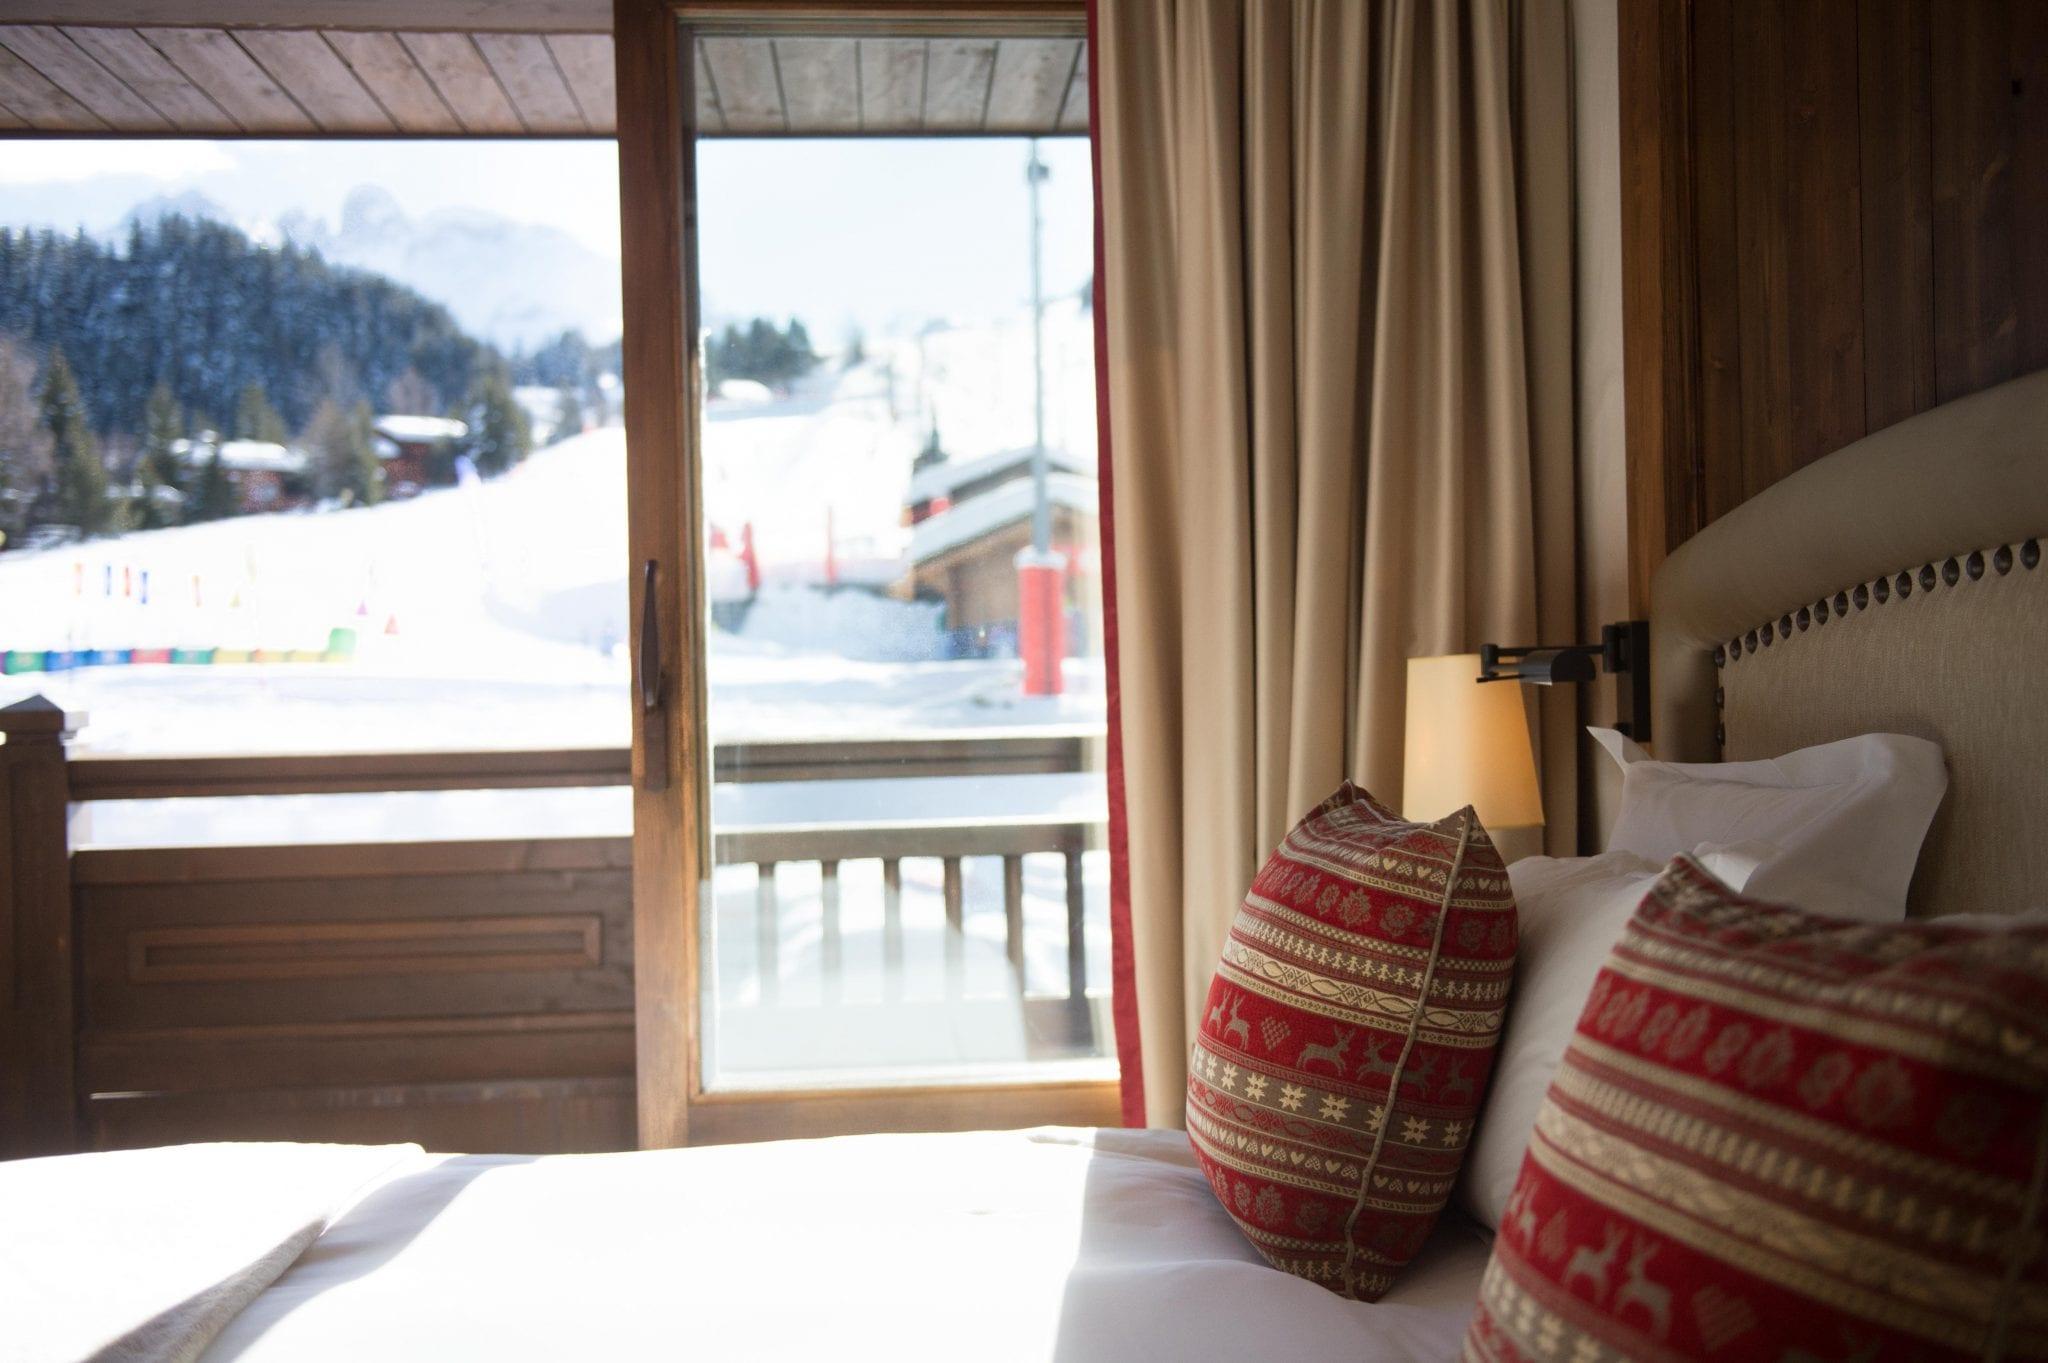 portetta-room-view-amy-murrell